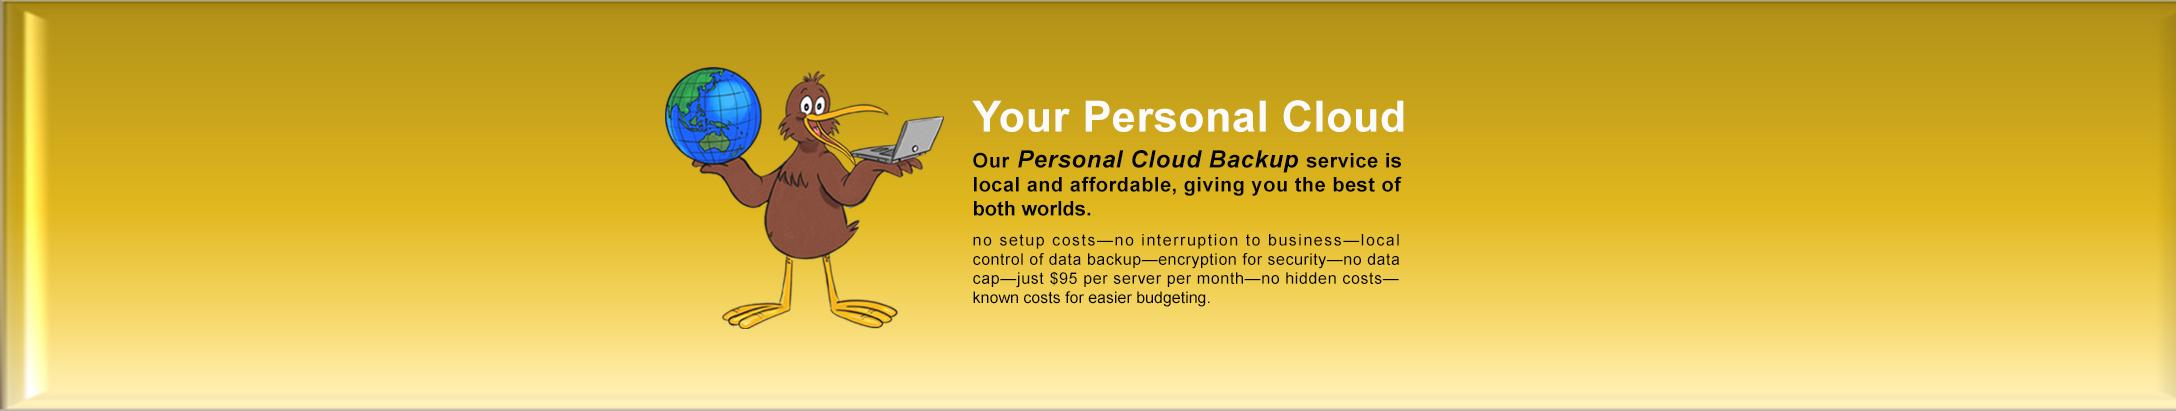 Personal Cloud Backup